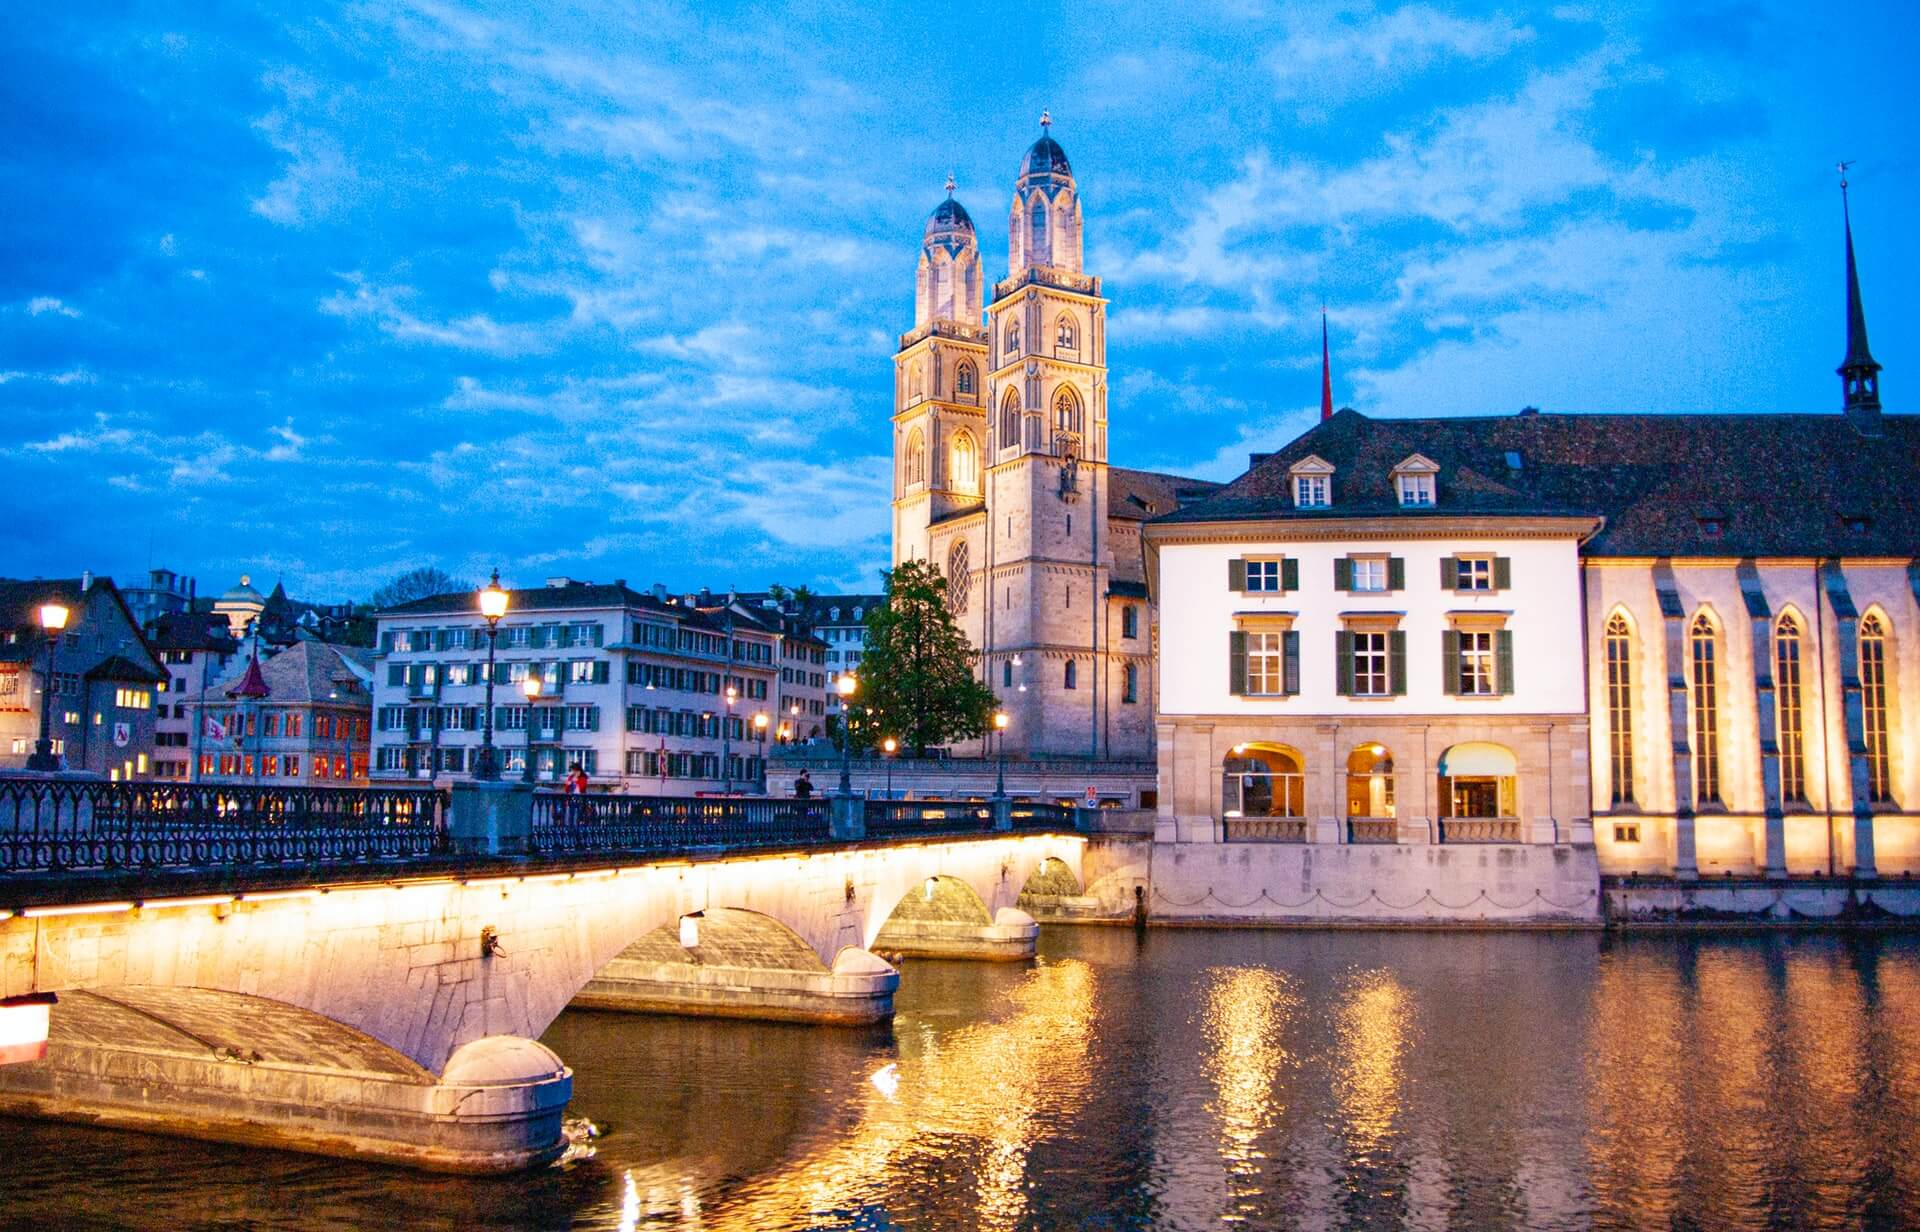 15 Must-Visit Places in Switzerland